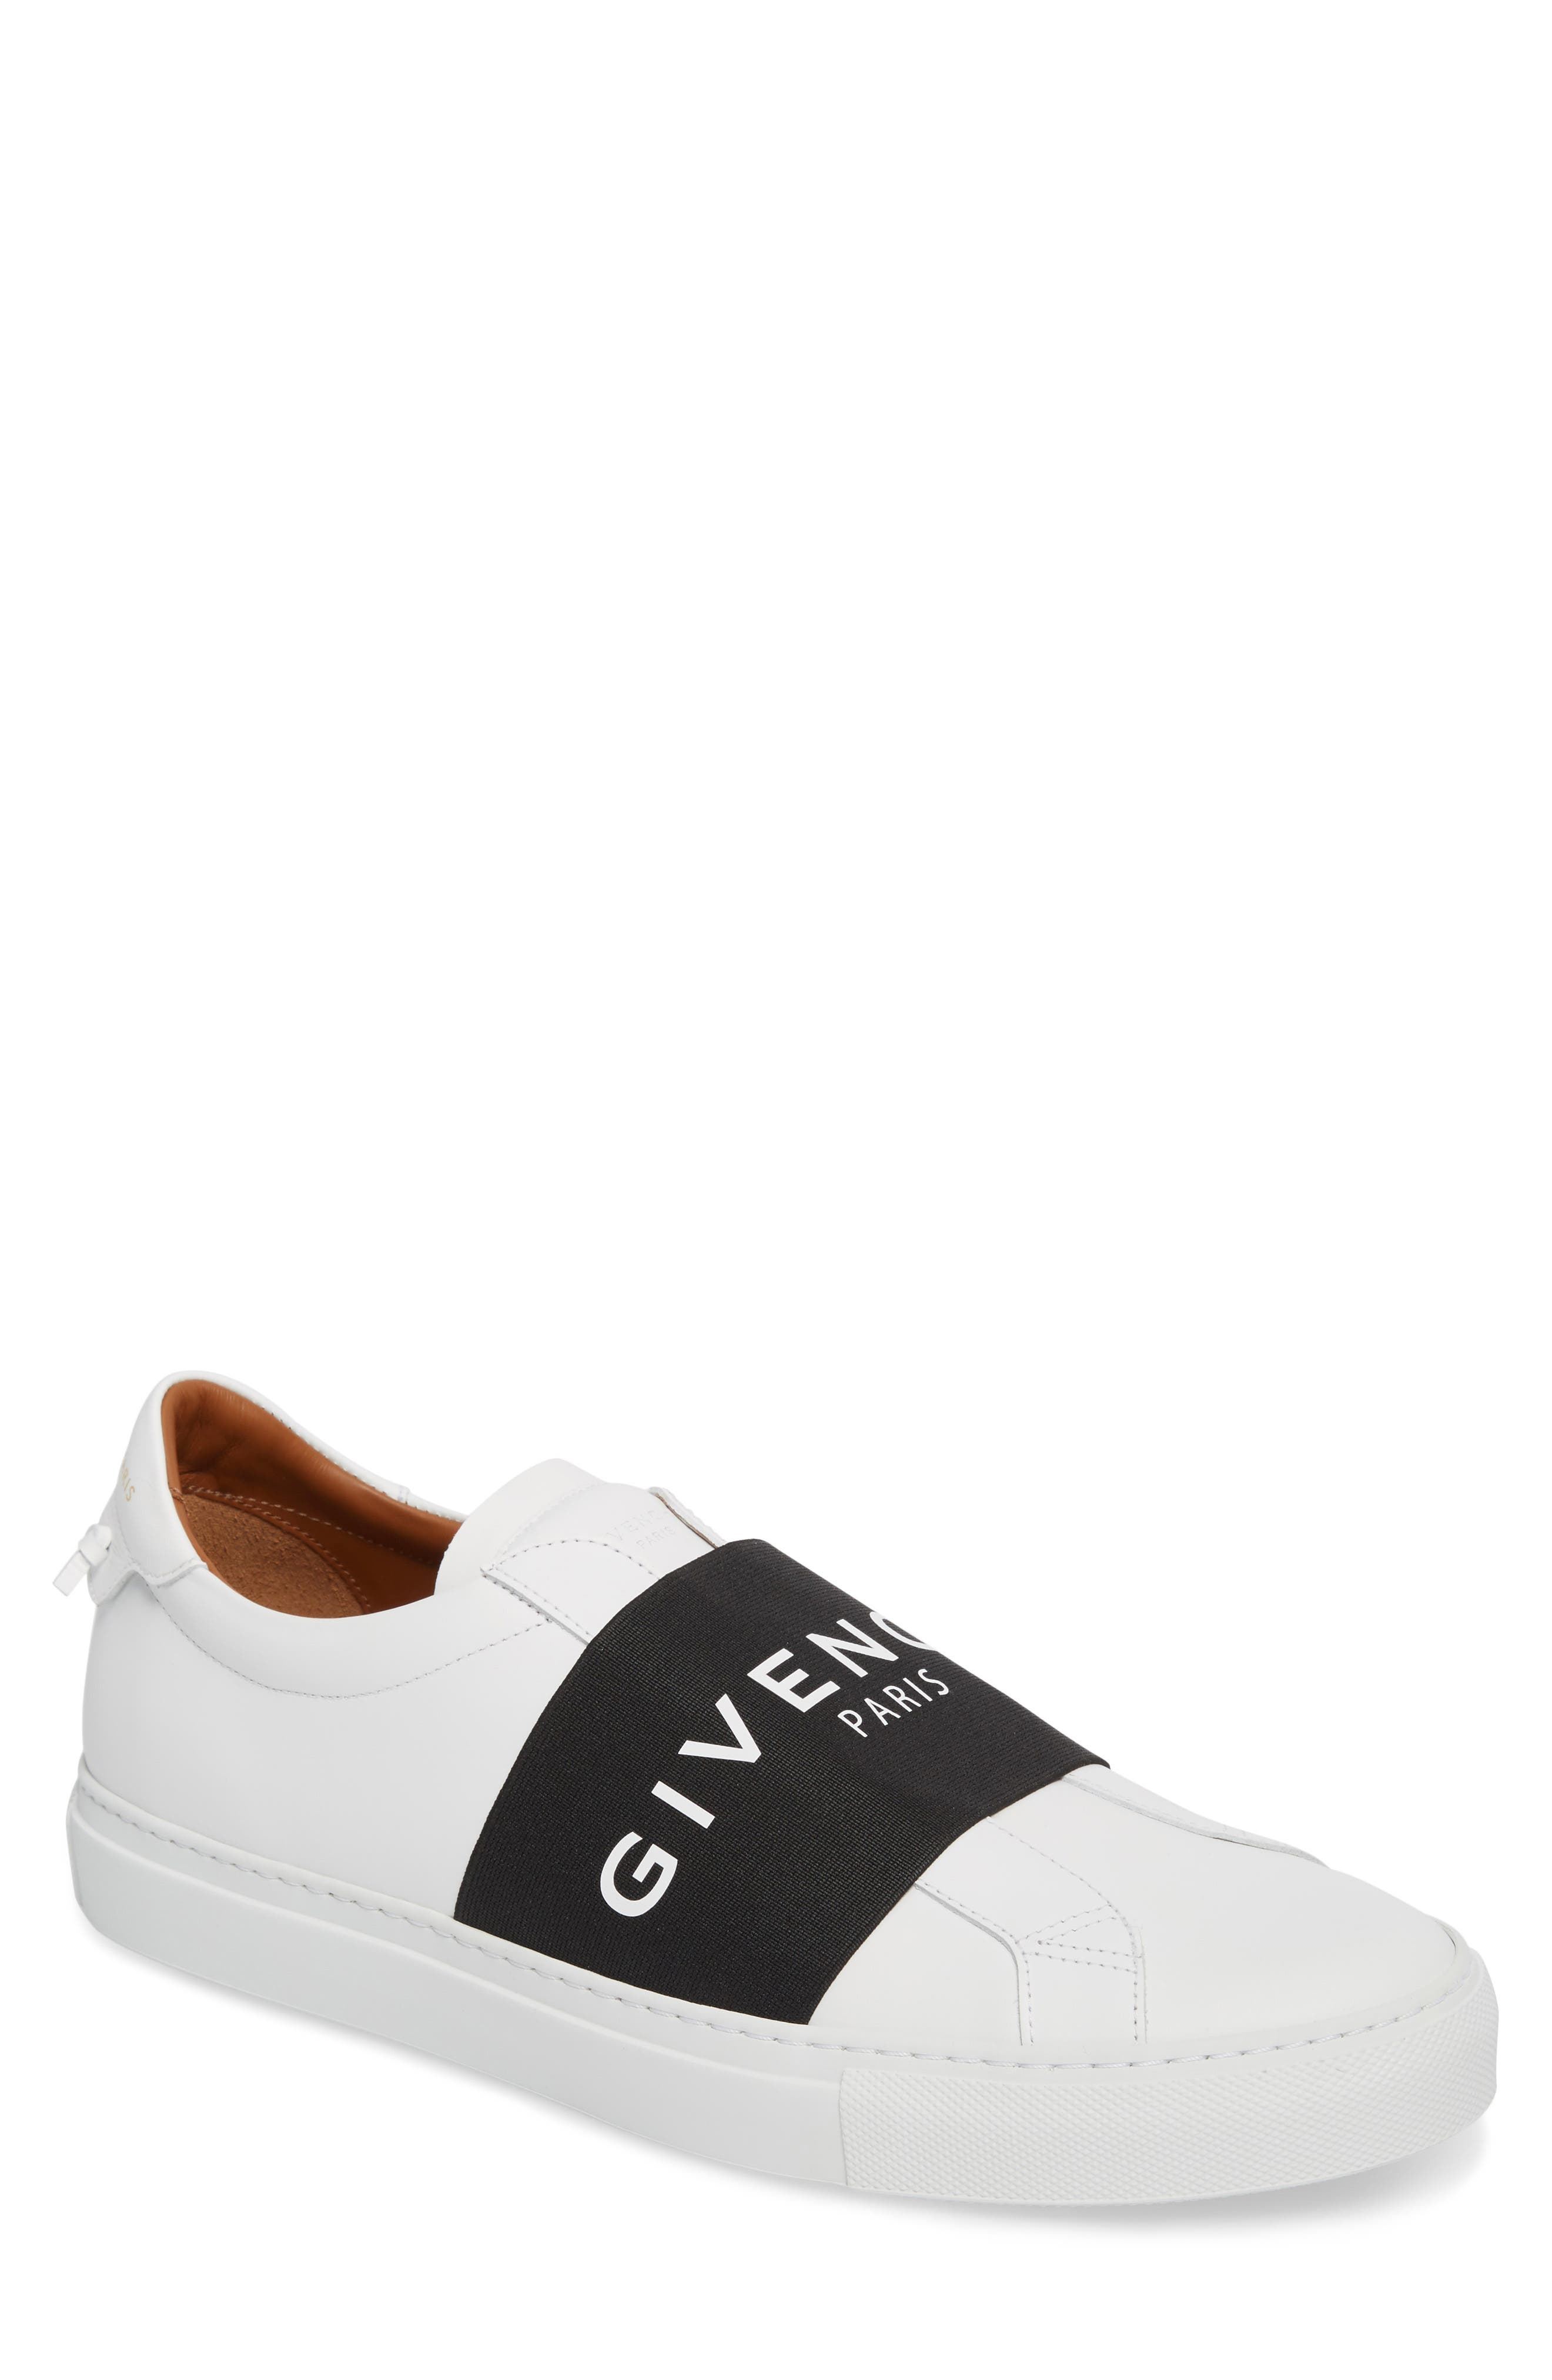 Alternate Image 1 Selected - Givenchy Urban Knots Sneaker (Men)